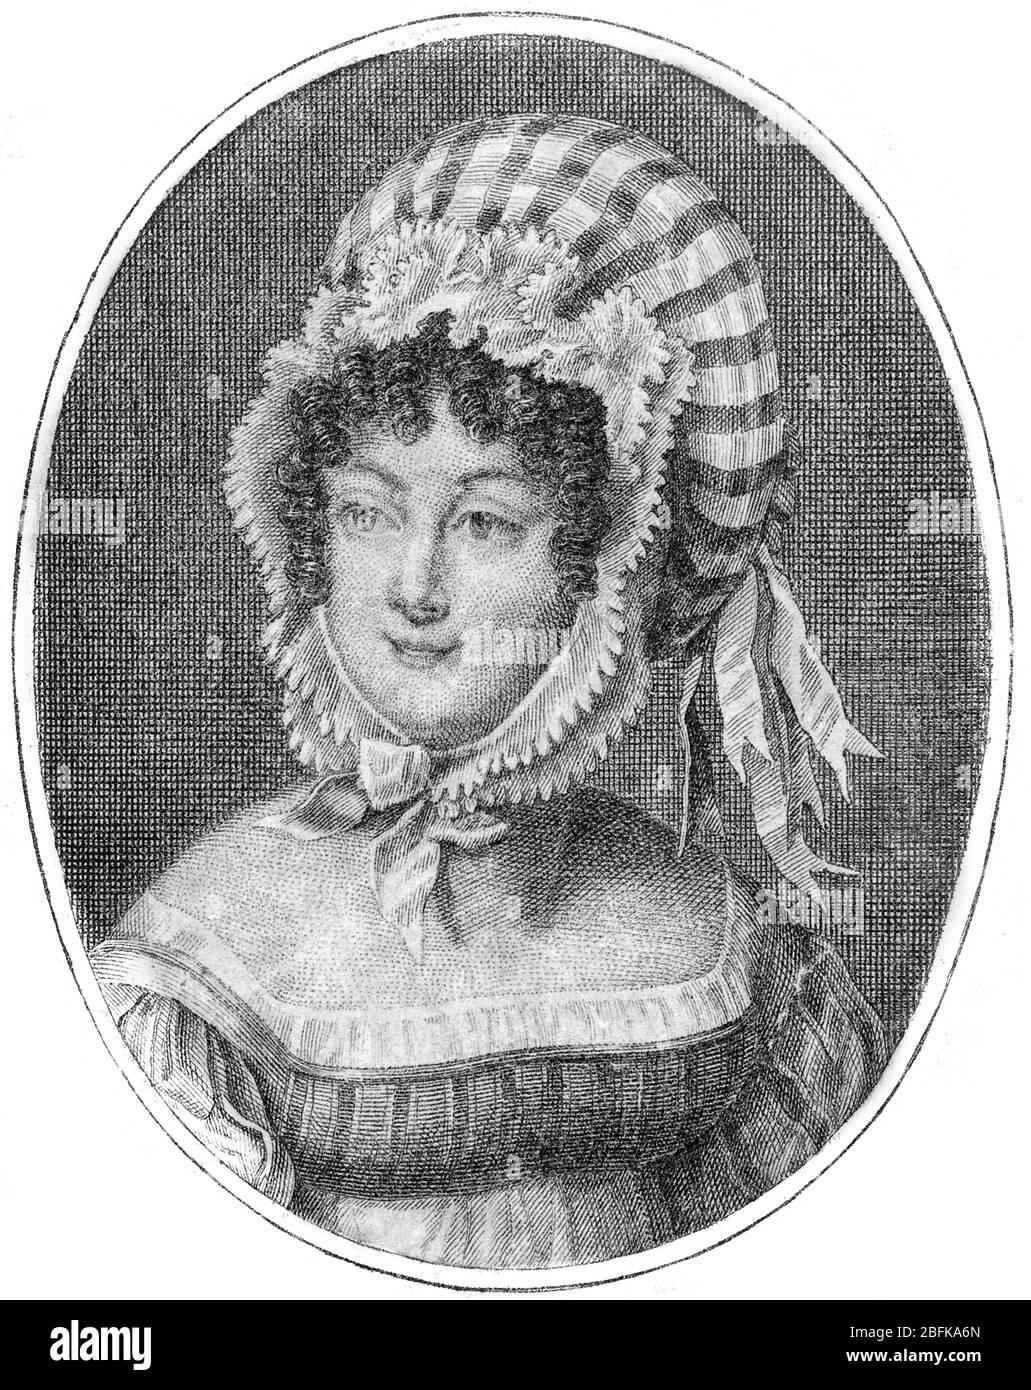 Head of a Woman Wearing a Striped Bonnet, engraving by Saint-Aubin (French, 1736-1807) Stock Photo